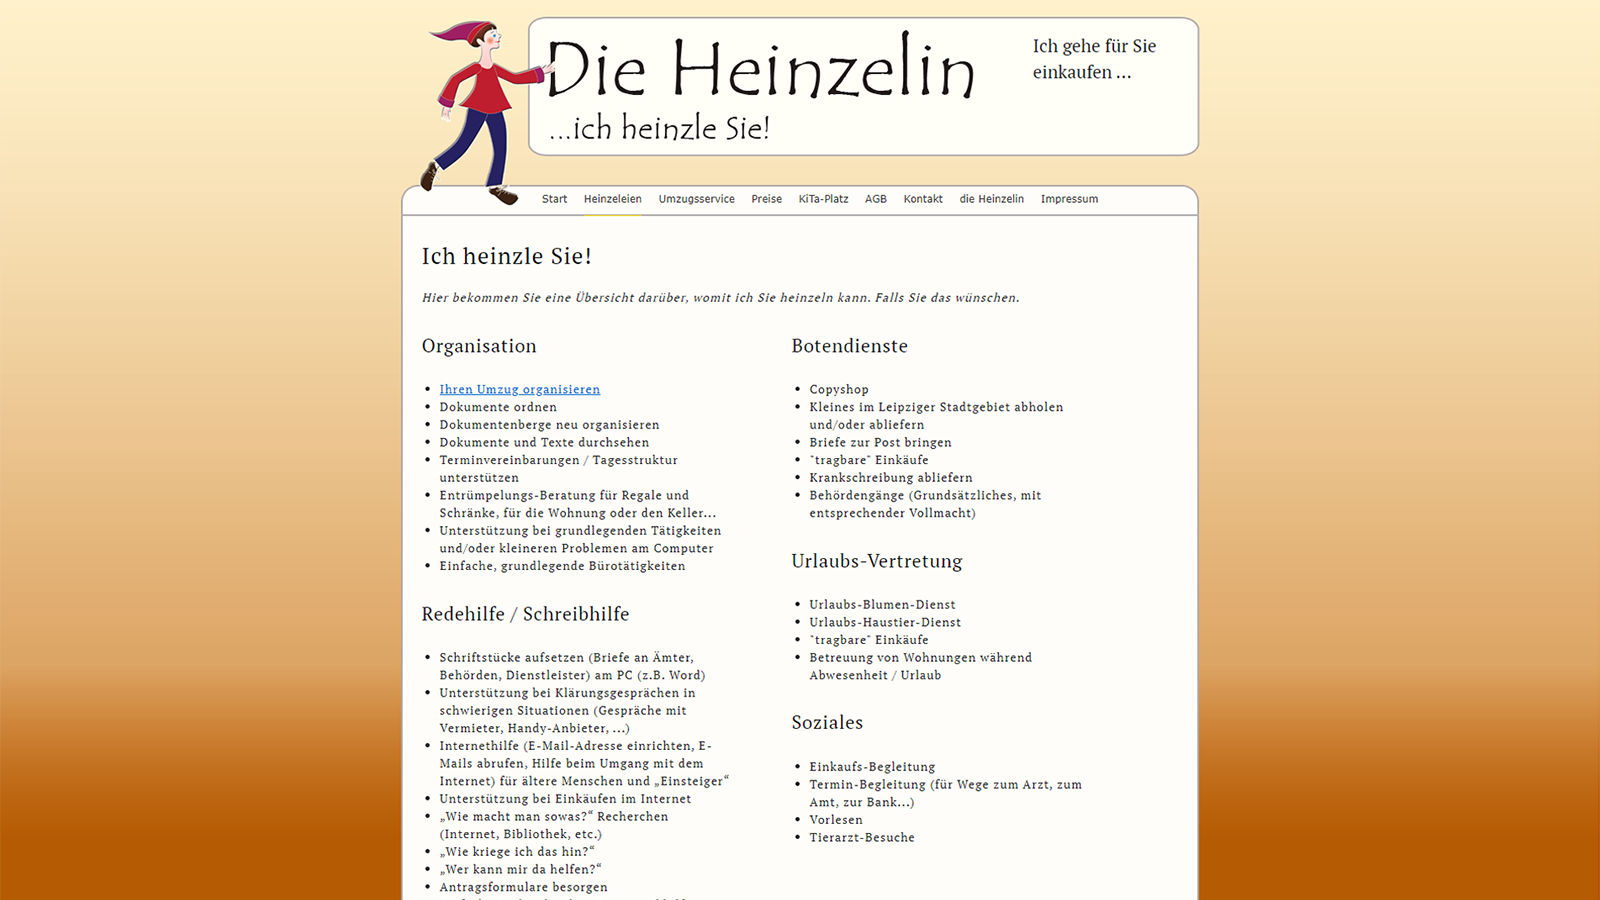 Screenshot Website Heinzeleien - DieHeinzelin